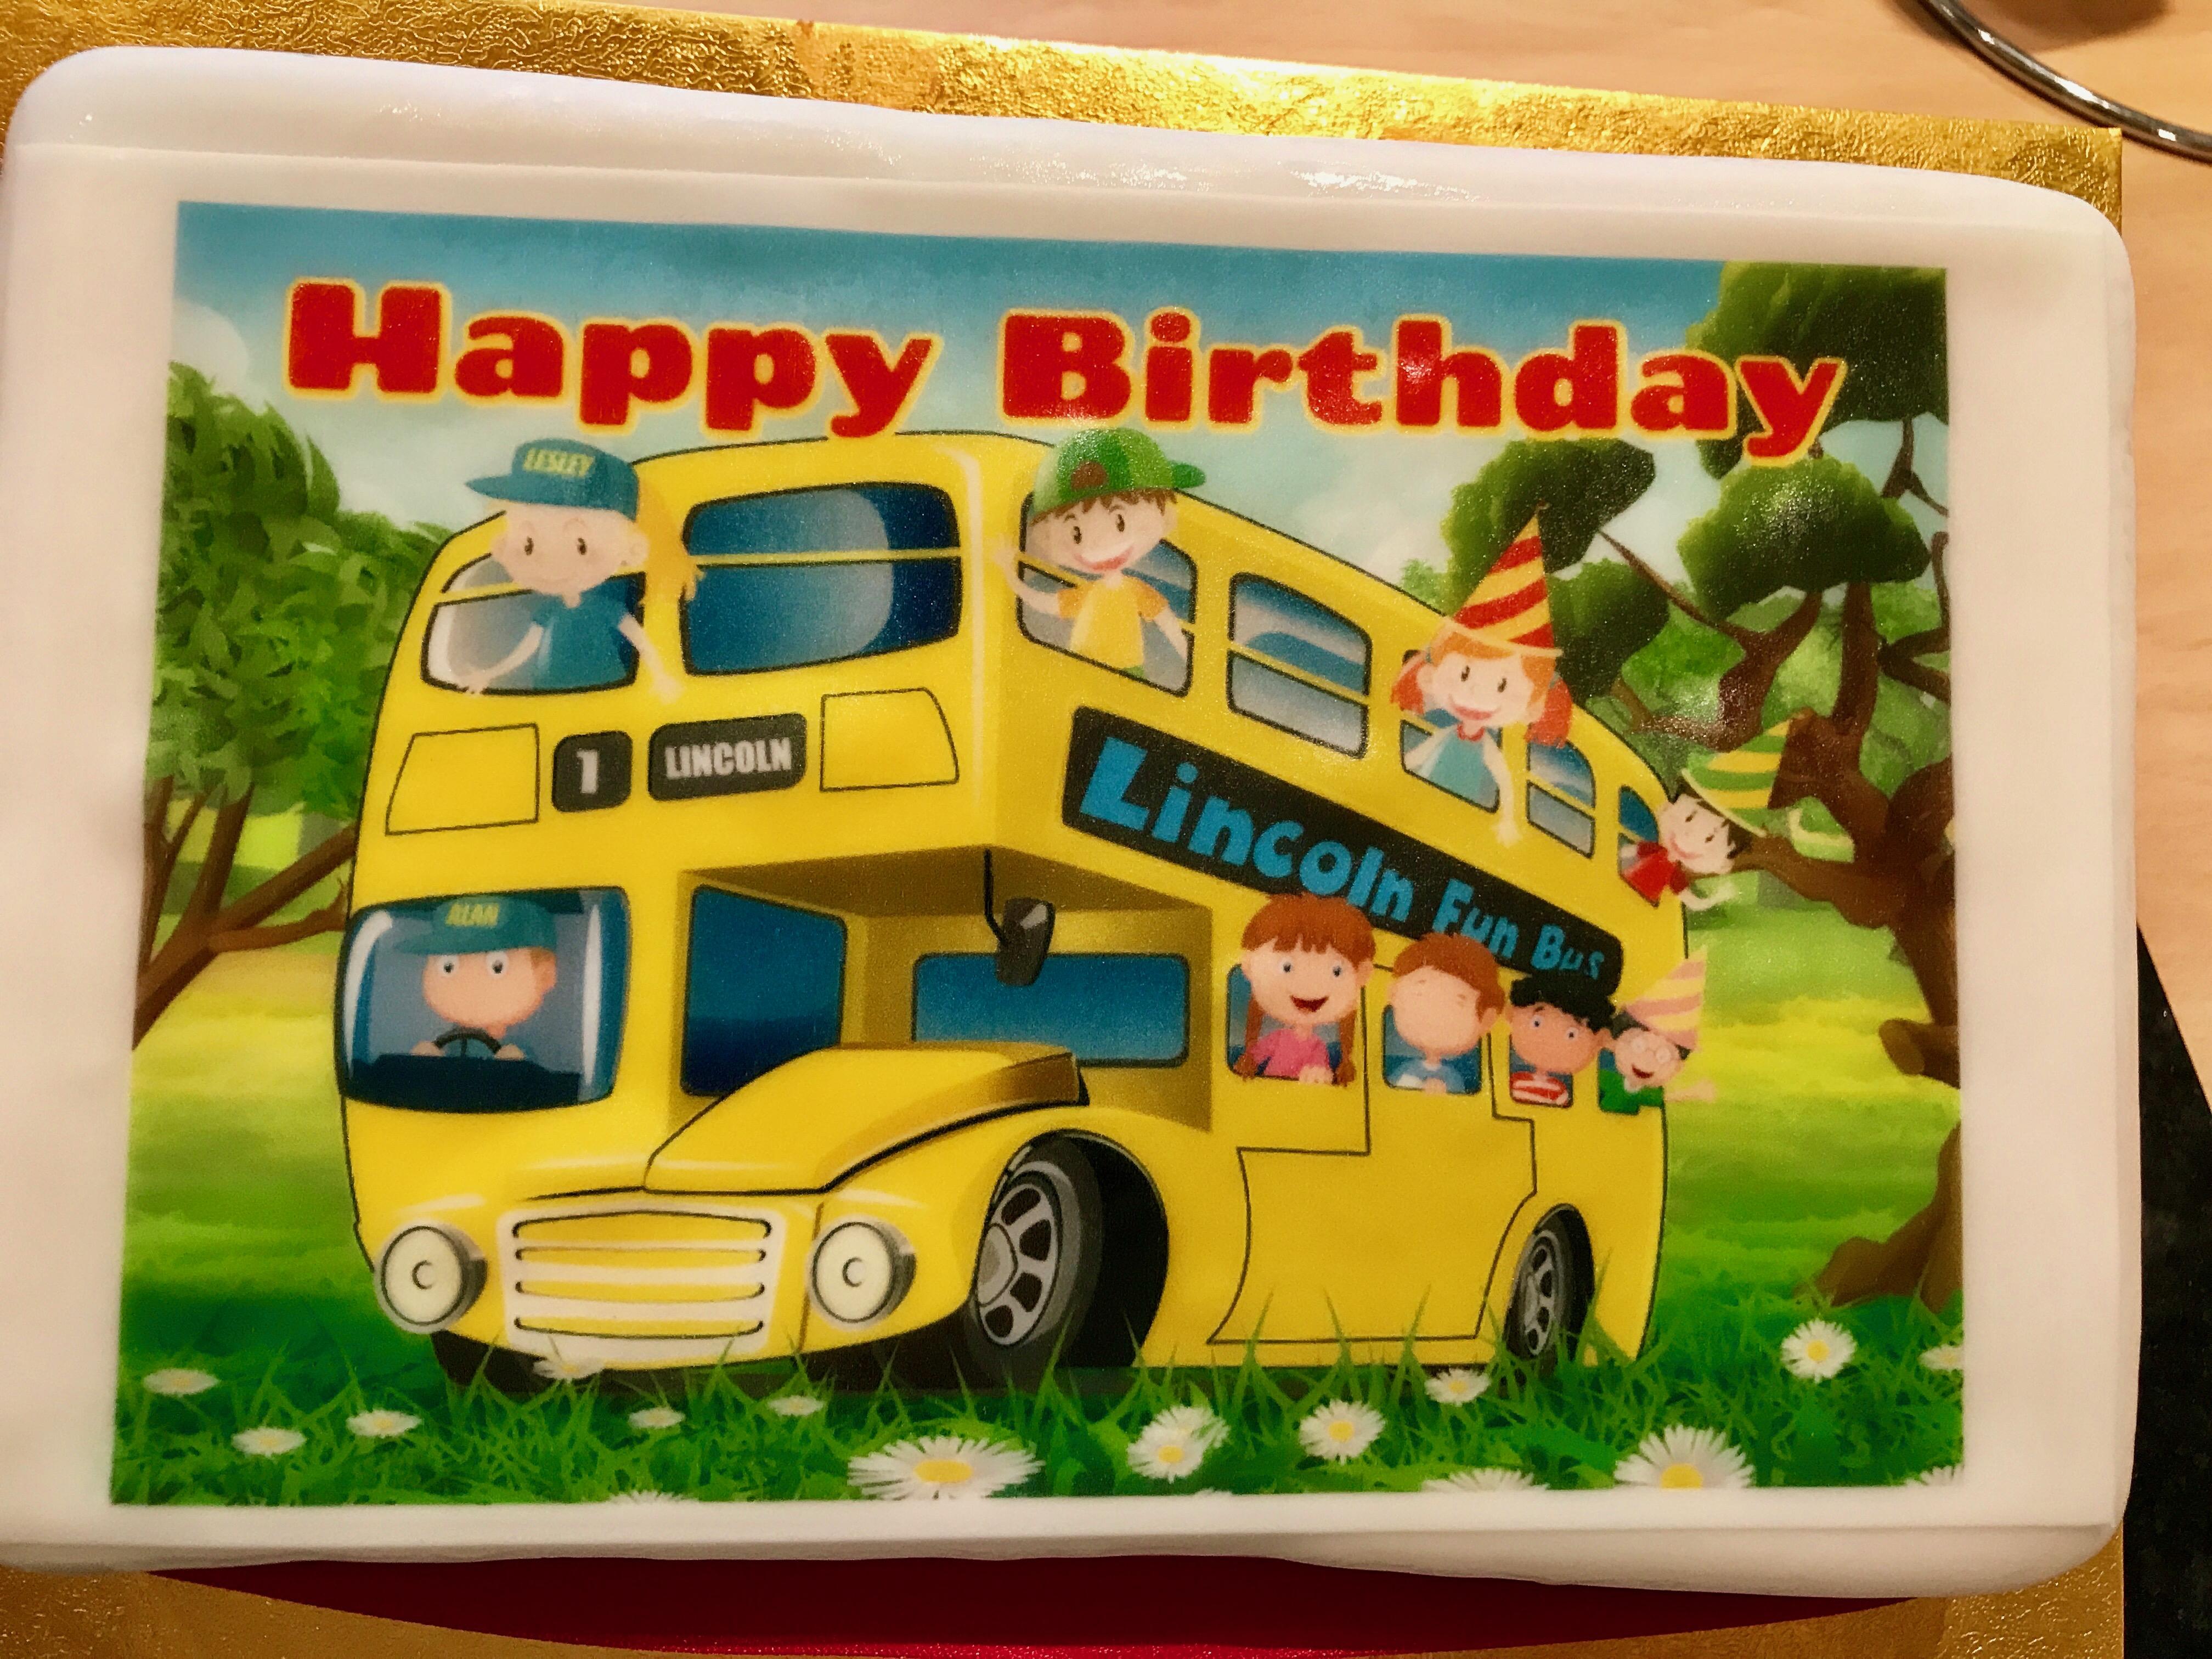 Lincoln Fun Bus